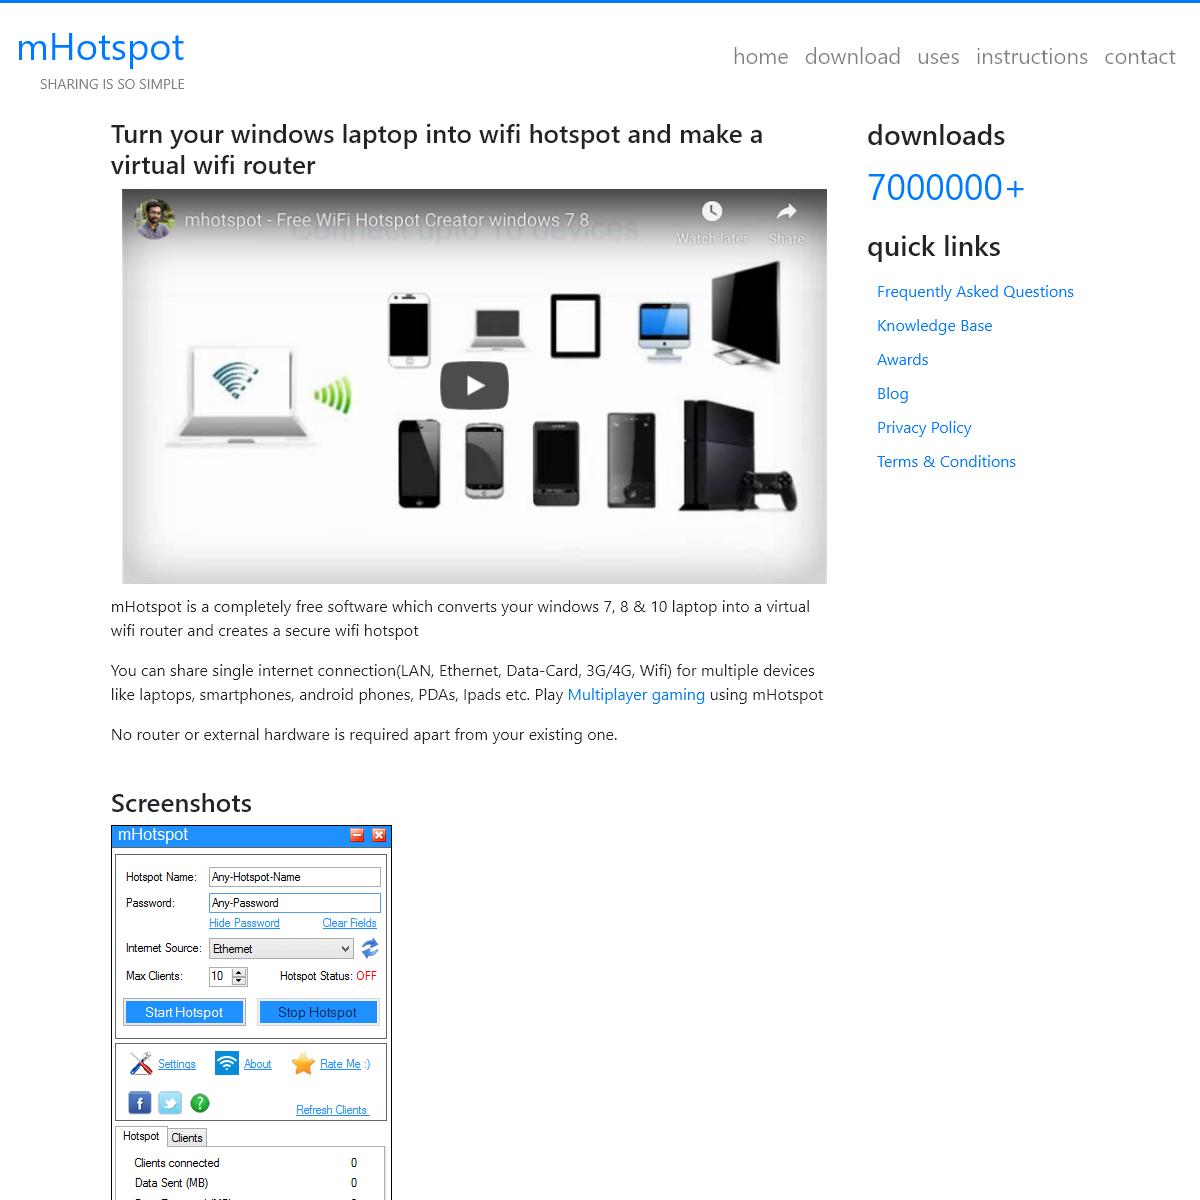 mHotspot - Turn your laptop into wifi hotspot